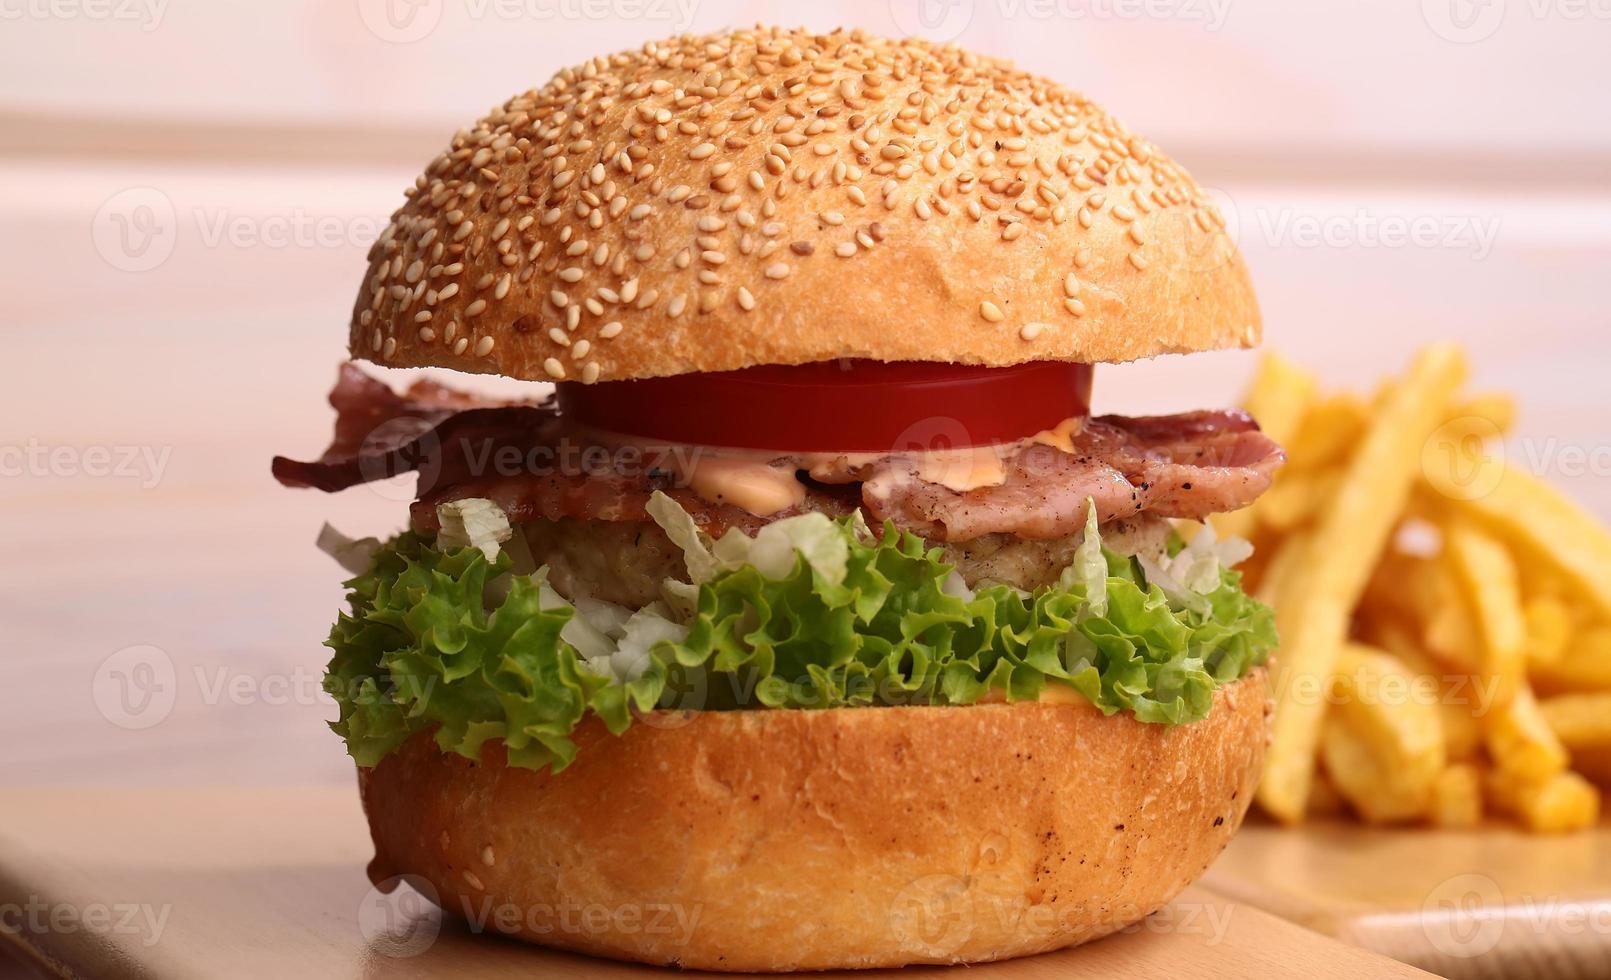 hamburguesa con papas fritas foto